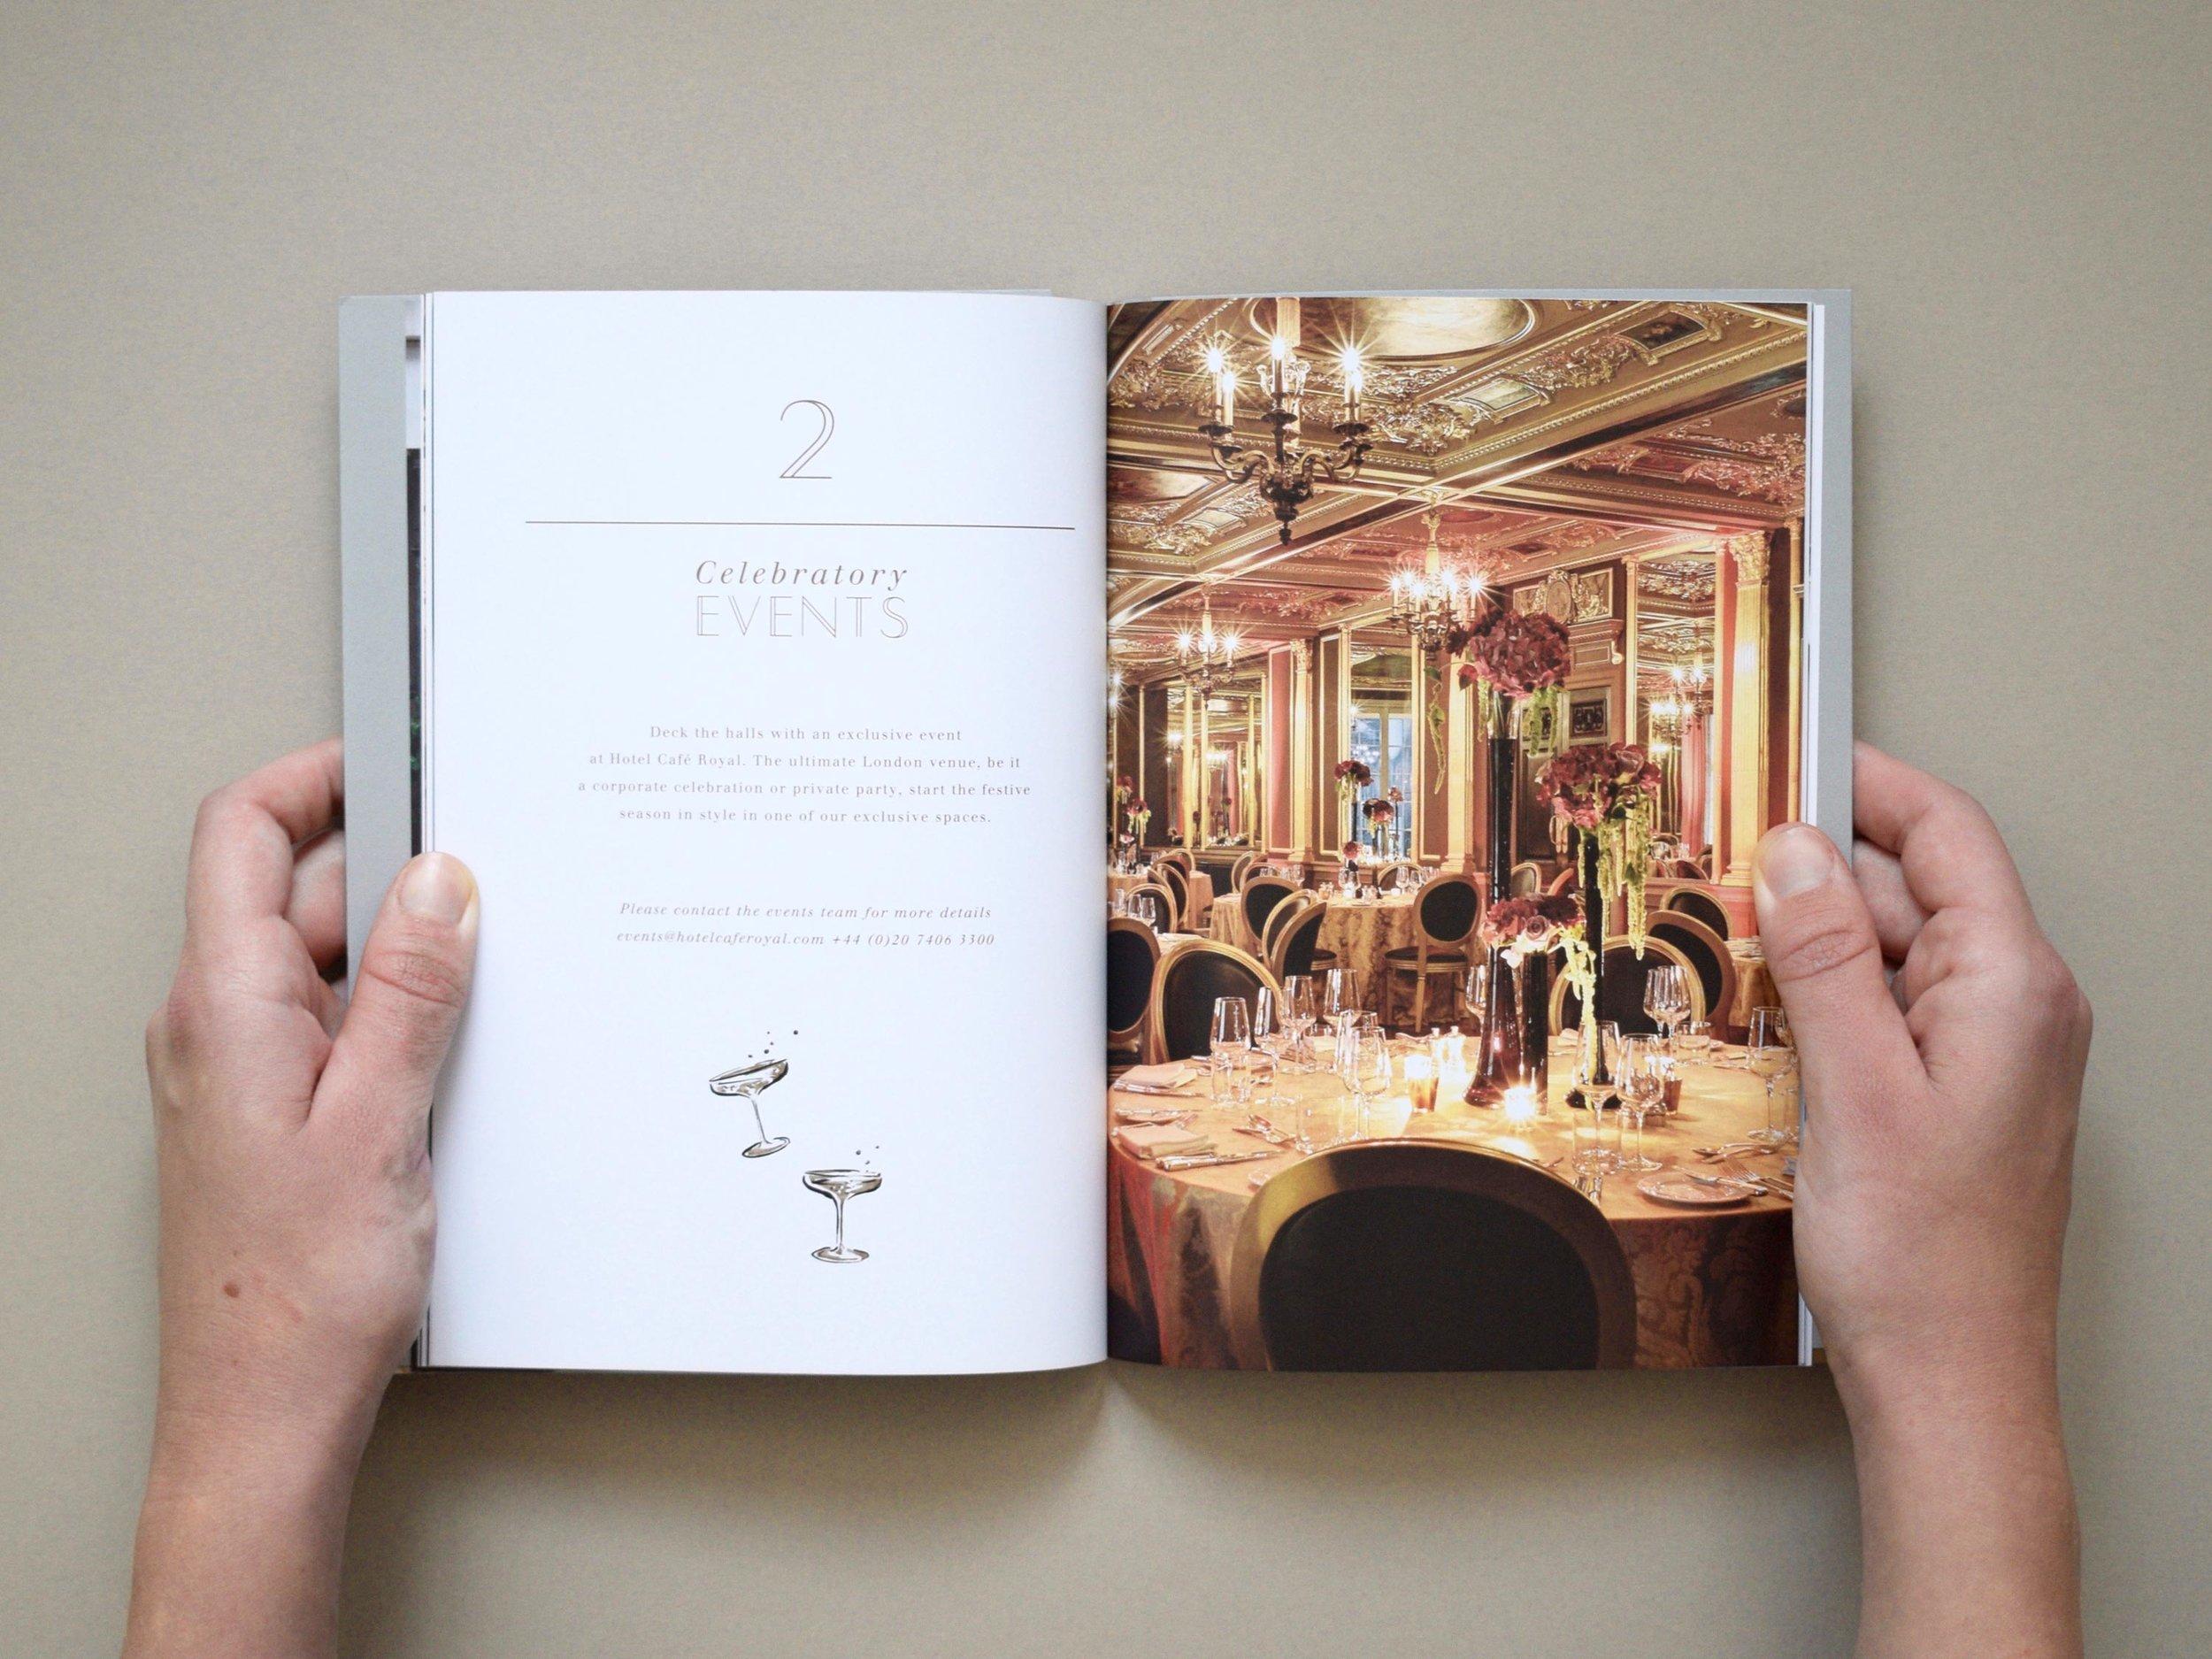 Hotel-Cafe-Royal_04.jpg